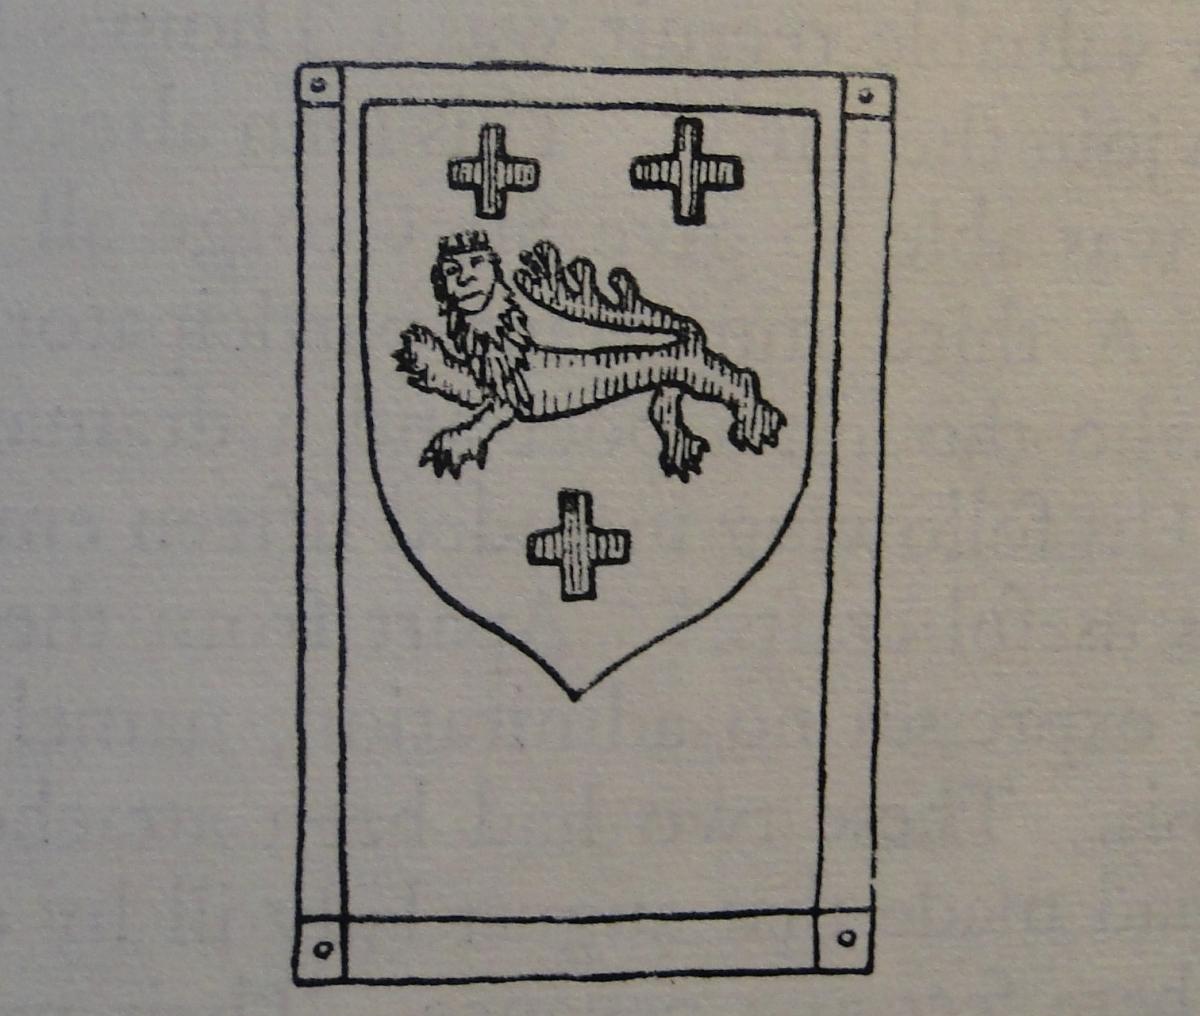 The Heraldic Arms of RichardLane